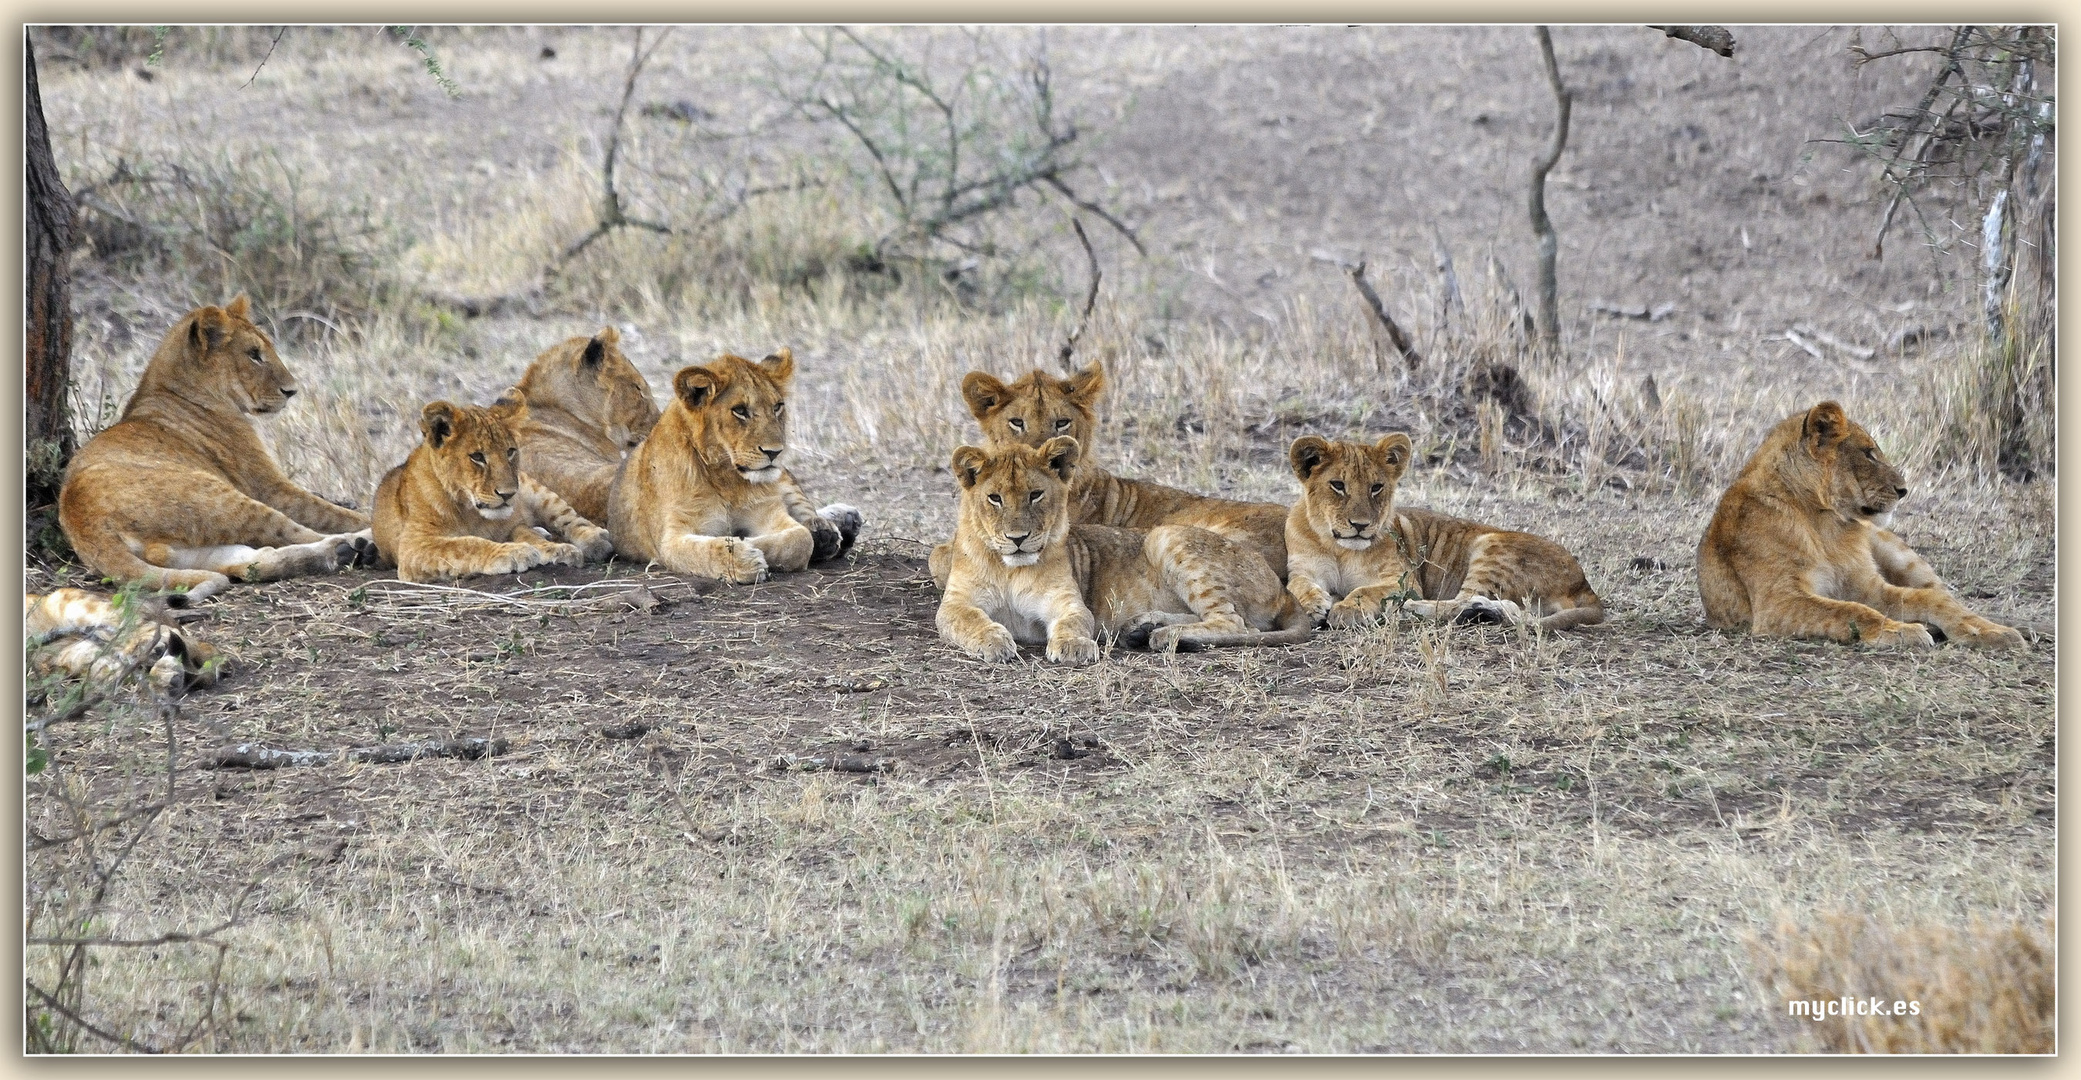 MEMORIAS DE AFRICA-UNOS LEONCILLOS-3 PN MASAI MARA -KENIA